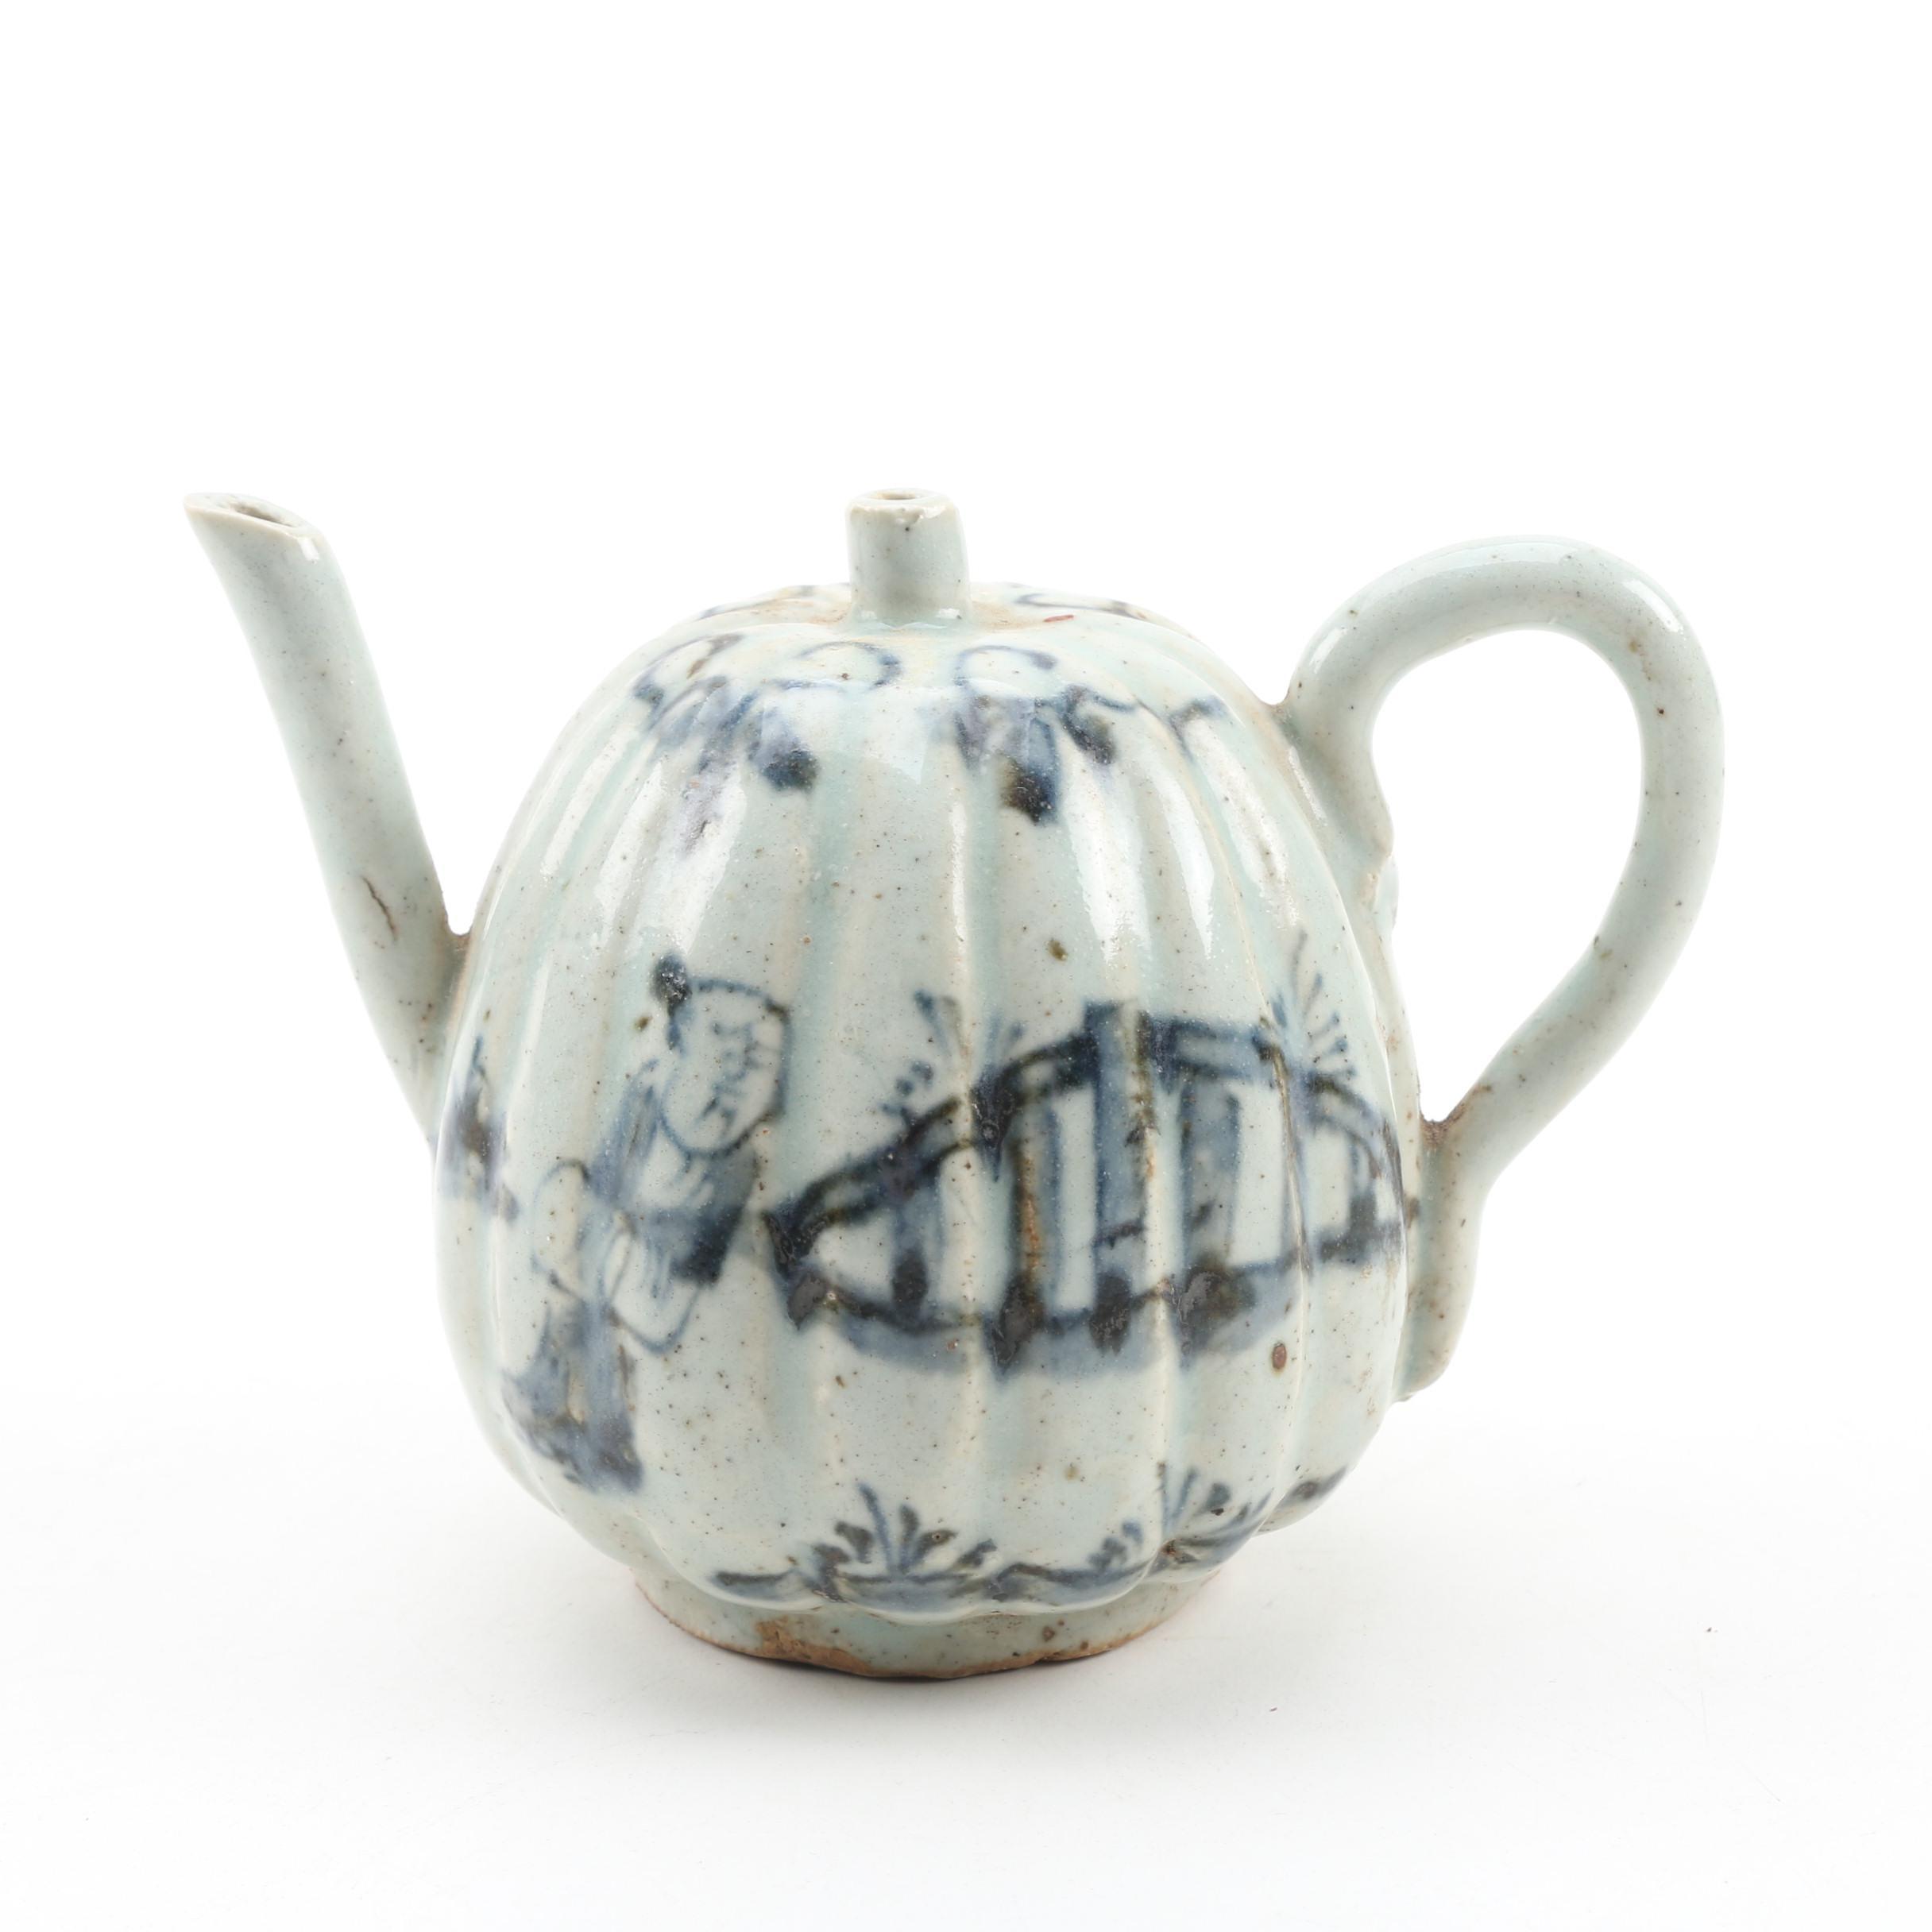 Japanese Imari Porcelain Calligraphy Water Dropper, Late 19th Century